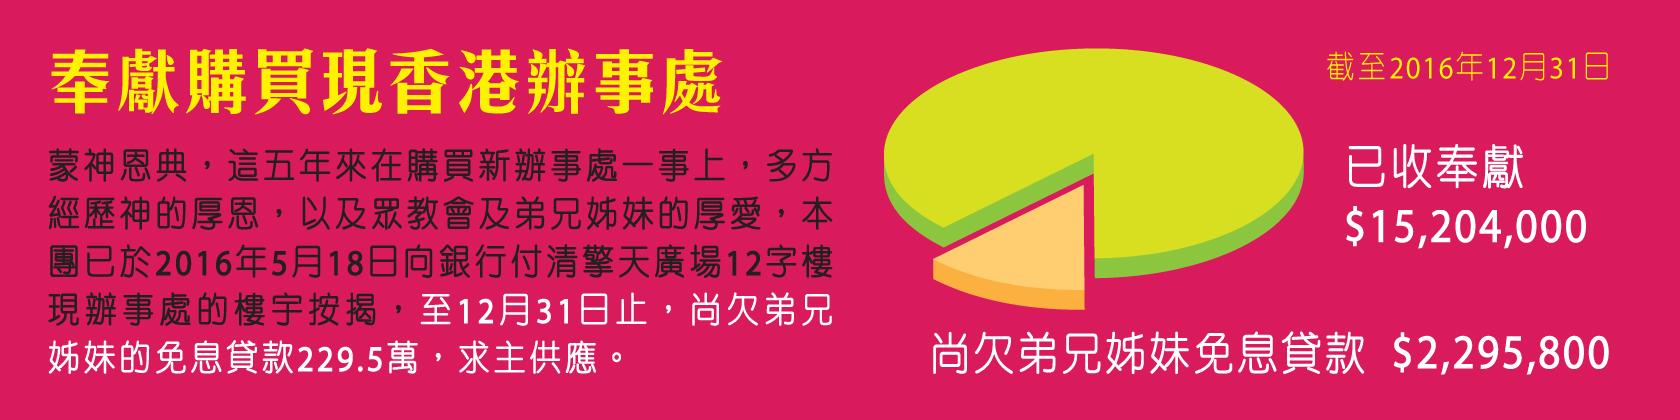 CB-02-web-banner-1680-x-420-028